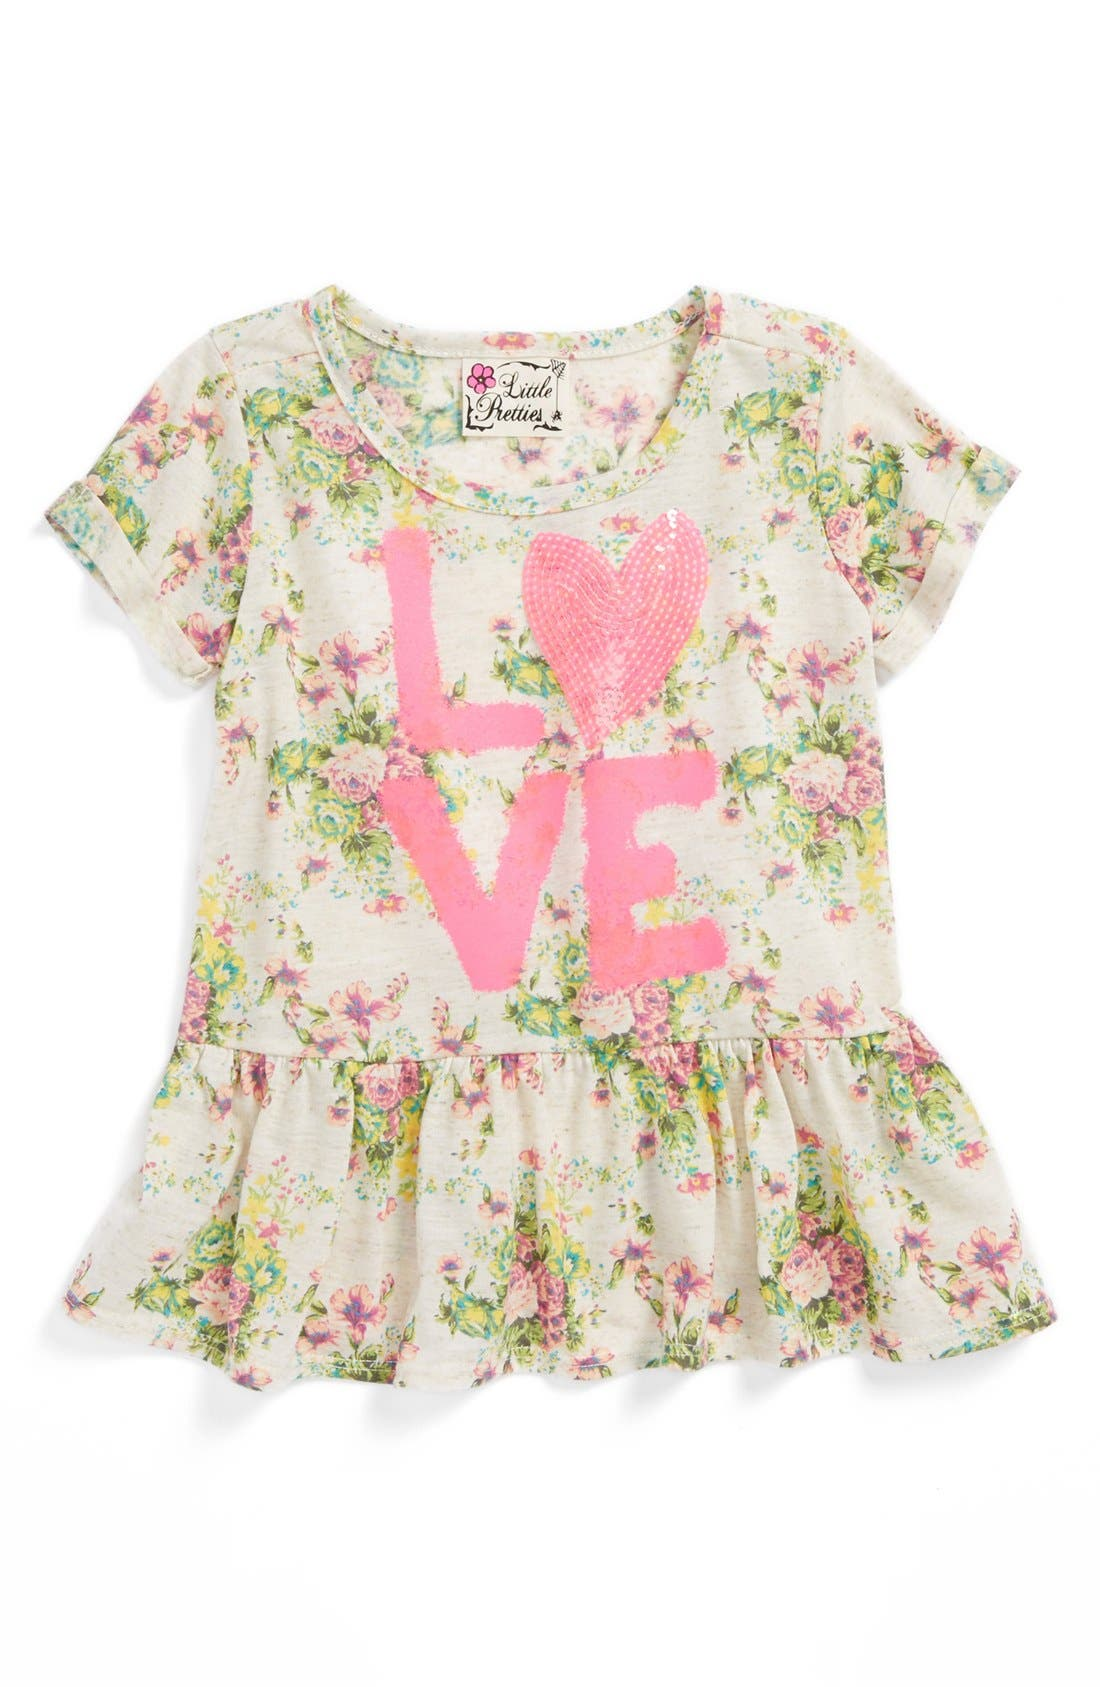 Alternate Image 1 Selected - Little Pretties 'Love' Peplum Tee (Toddler Girls)